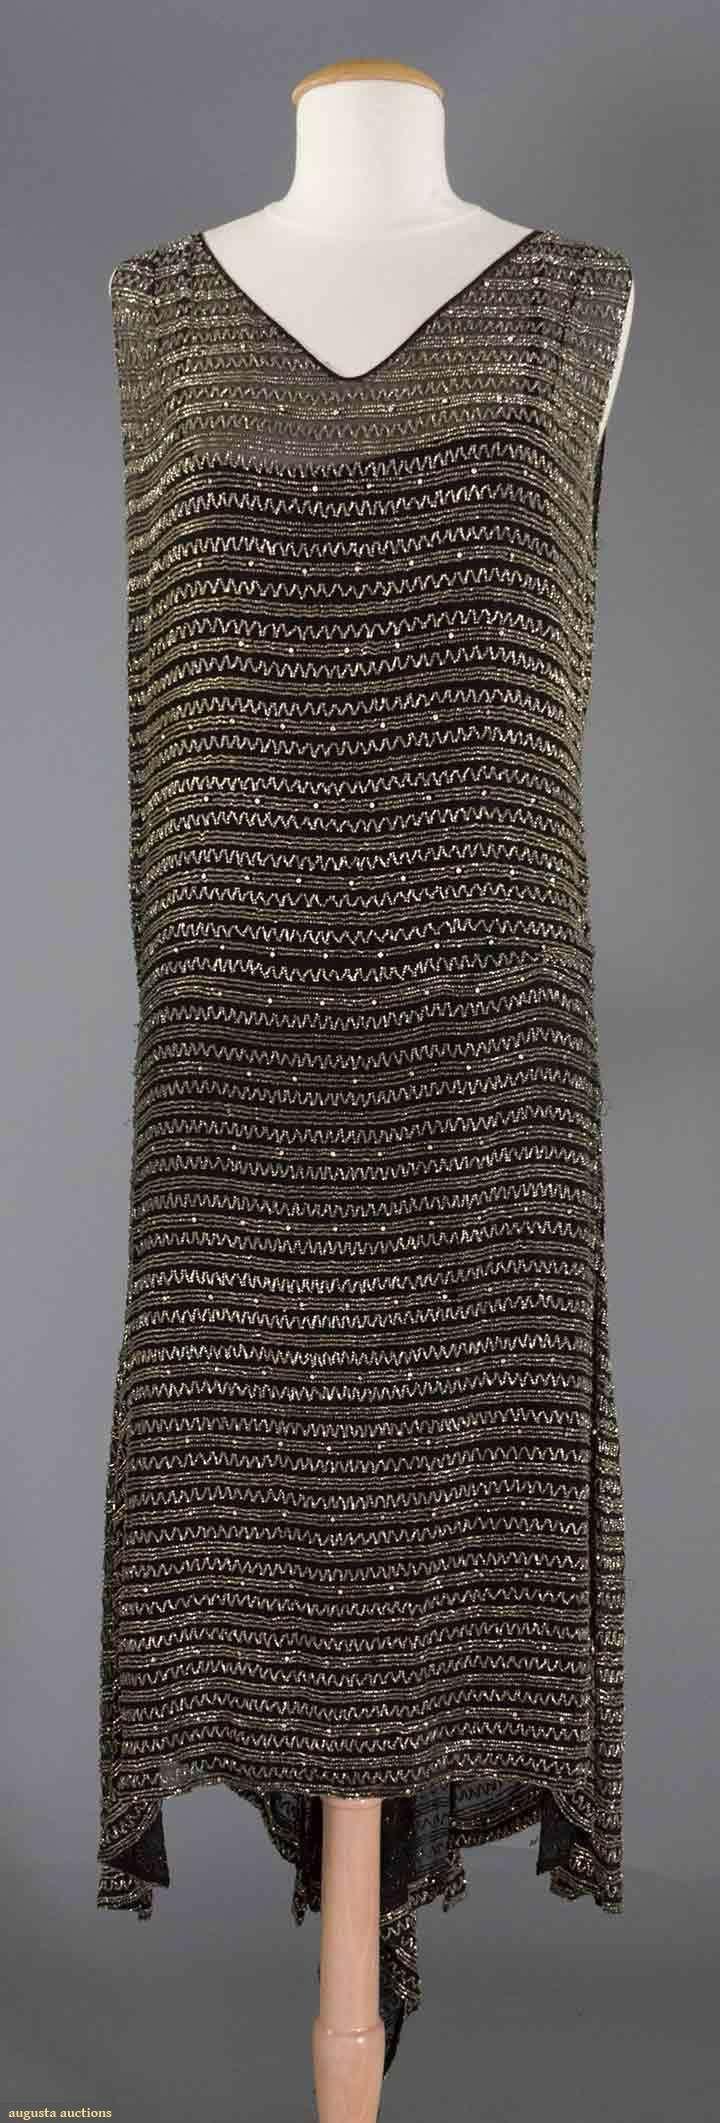 CRYSTAL BEADED SILK DRESS, c. 1928  Black chiffon over satin lining, crystal beaded narrow horizontal rows, back hem longe